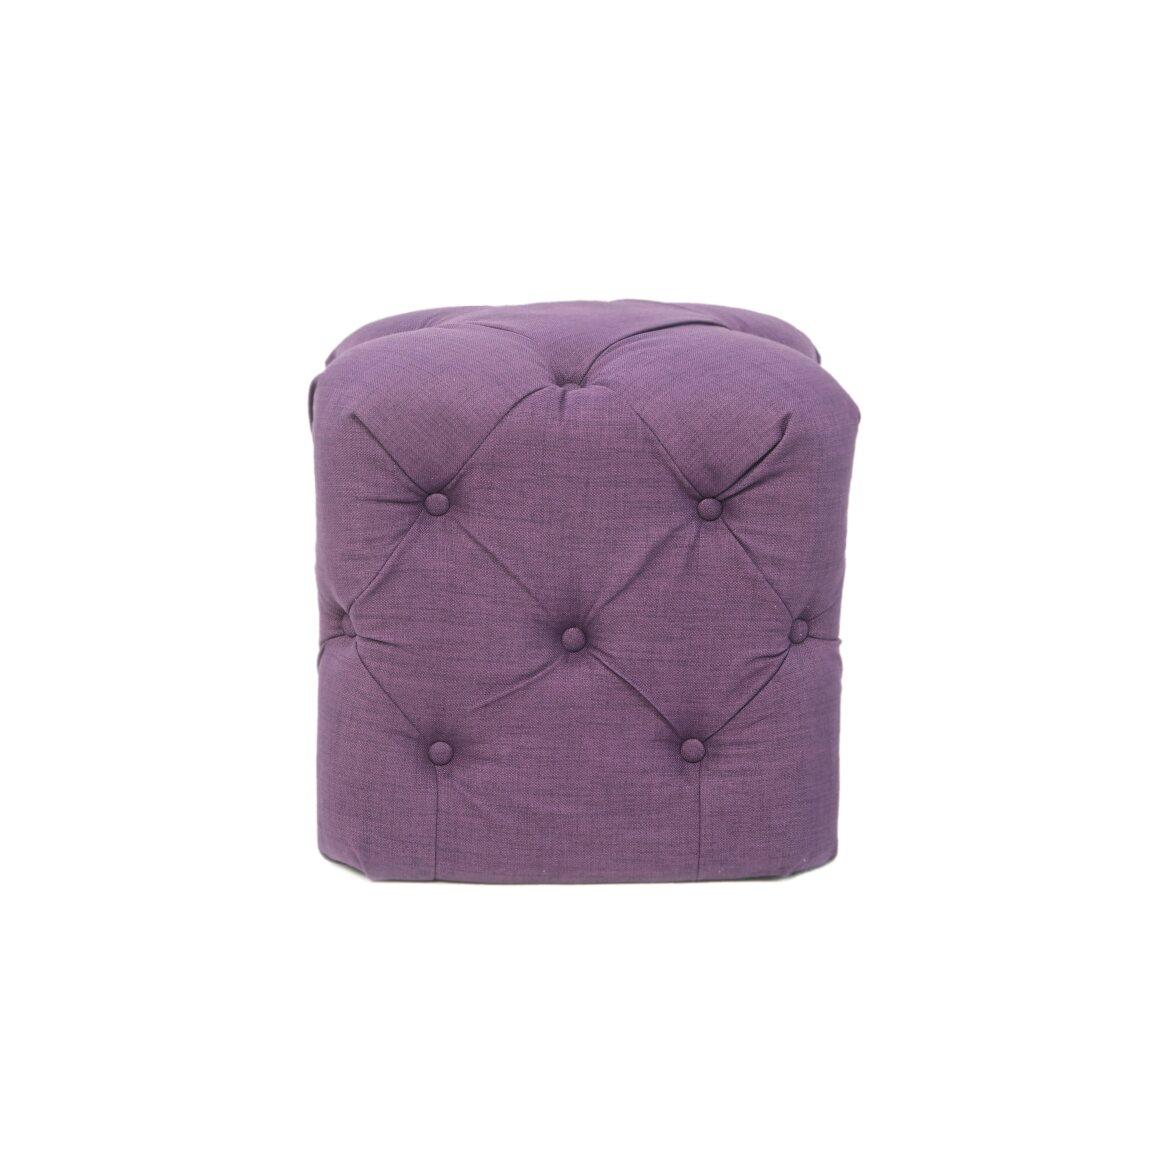 Пуф Amrit purple | Пуфы Kingsby